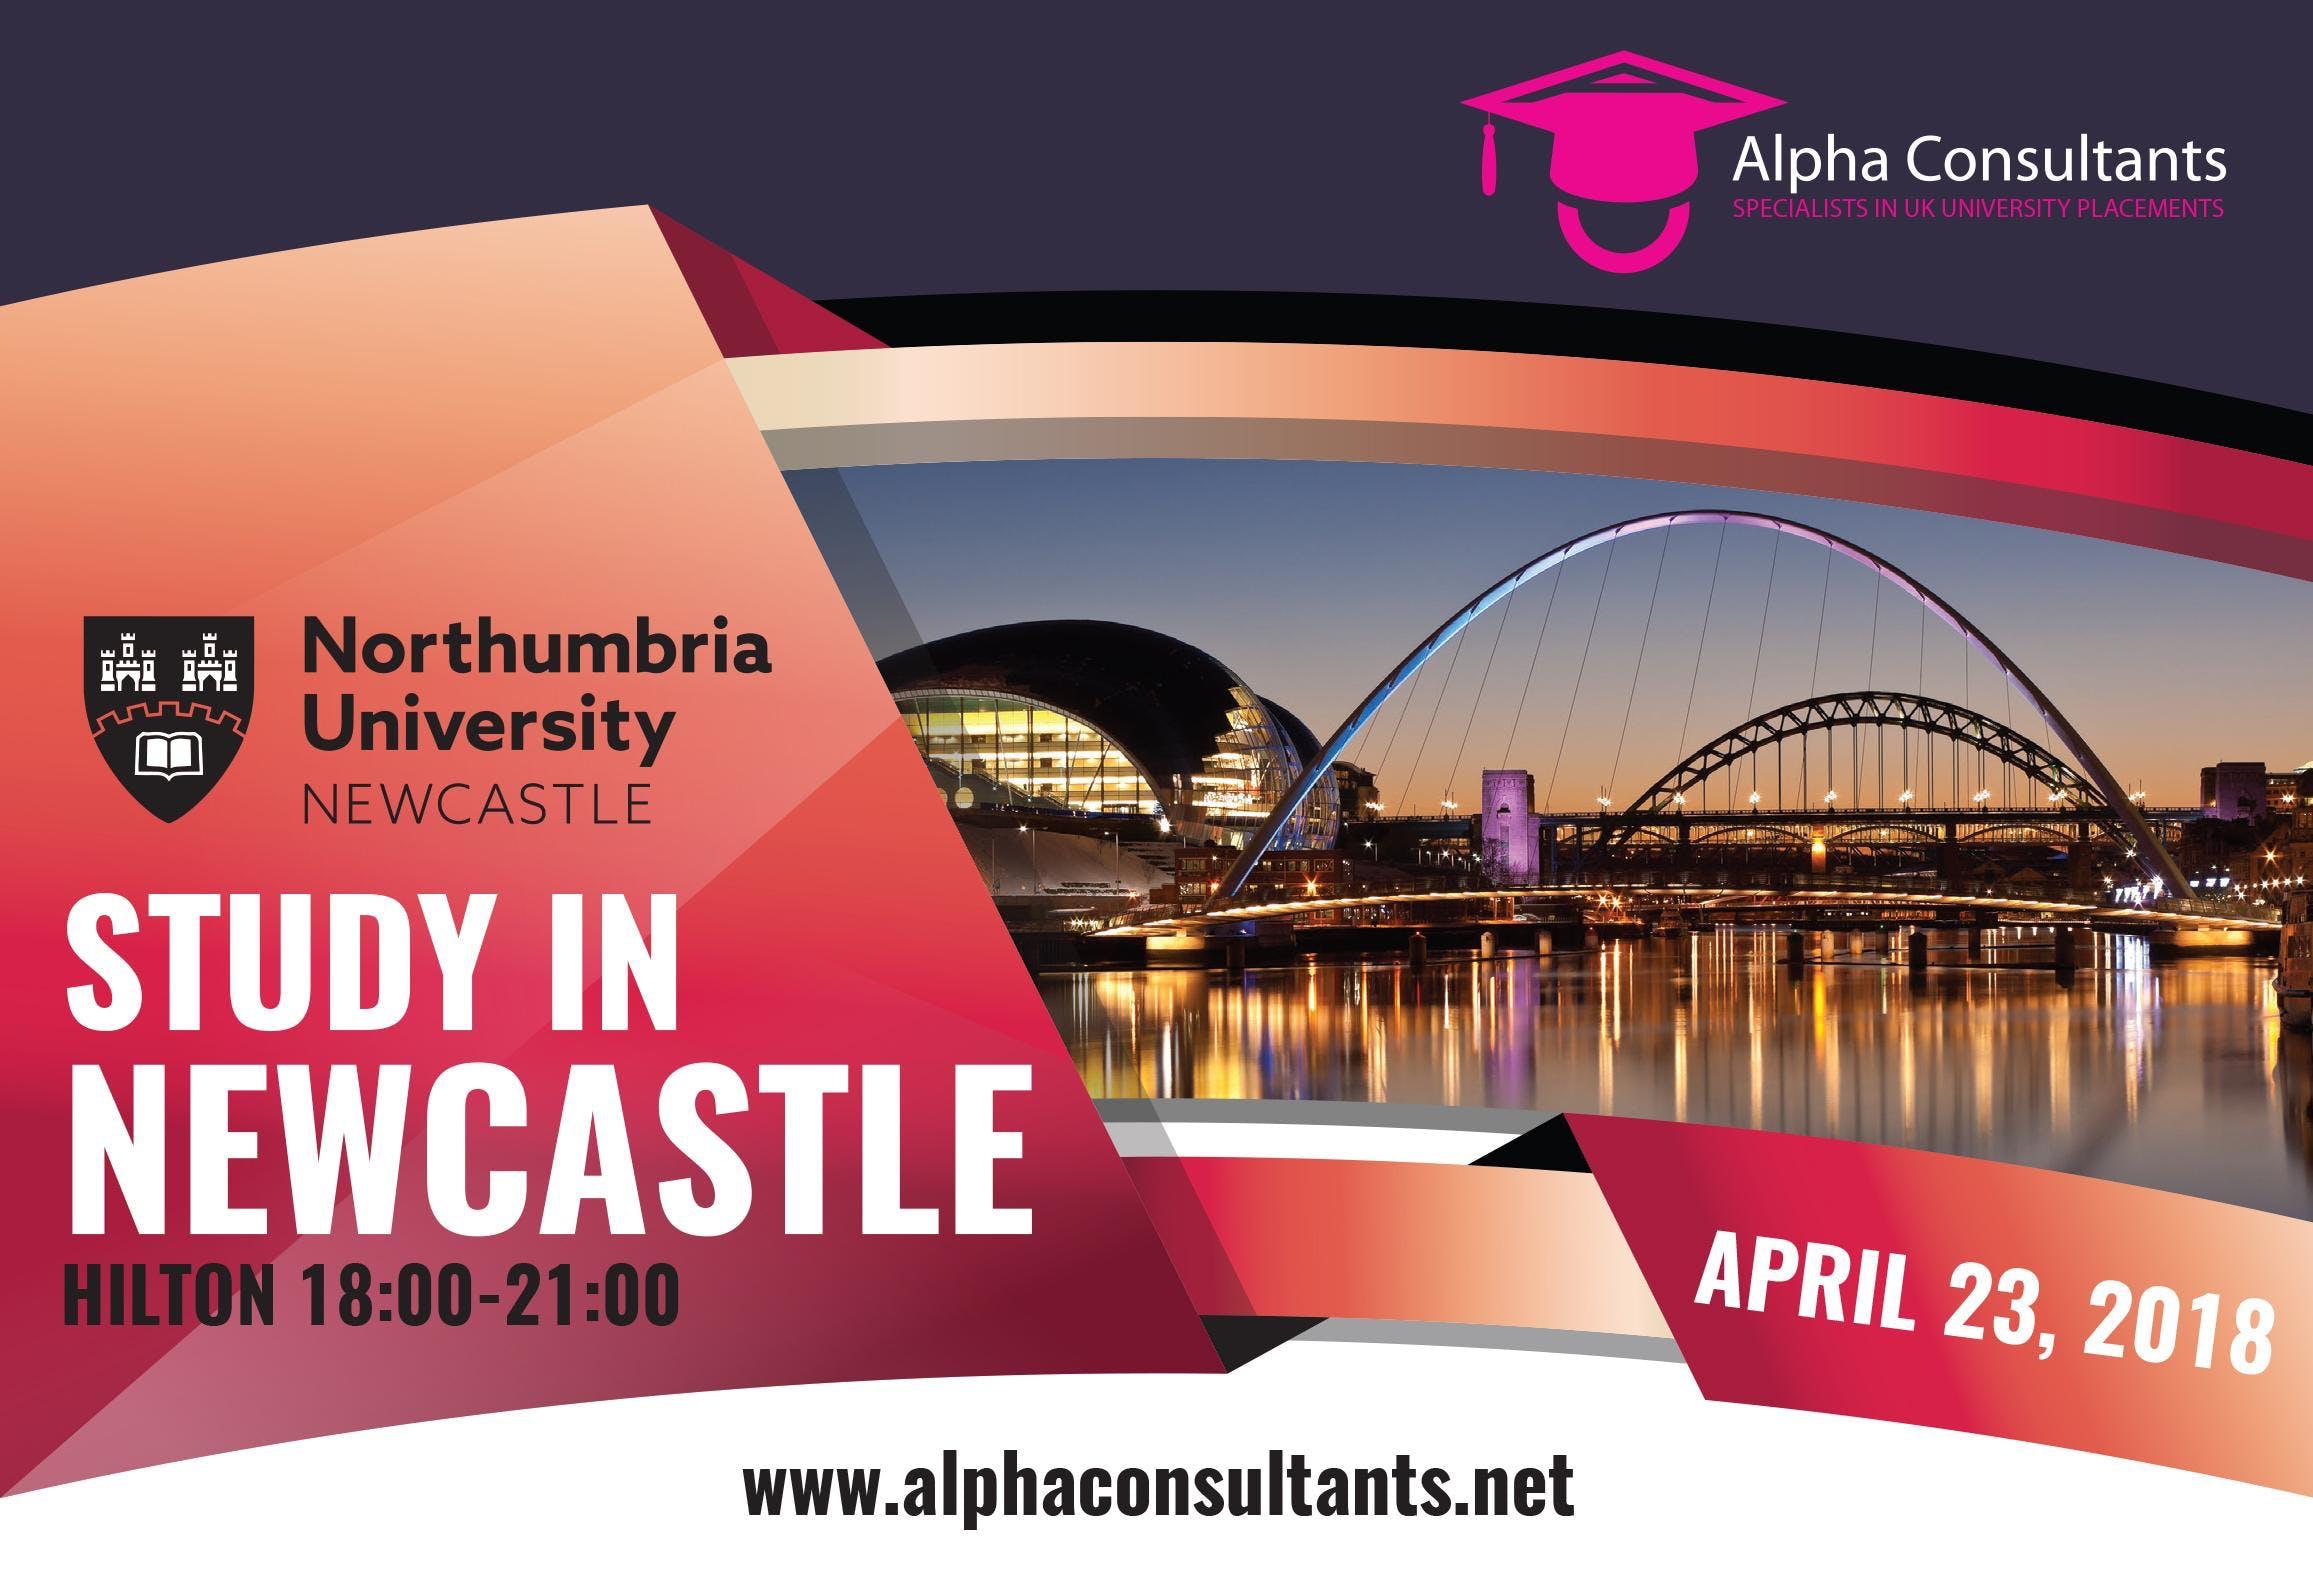 Study in Newcastle